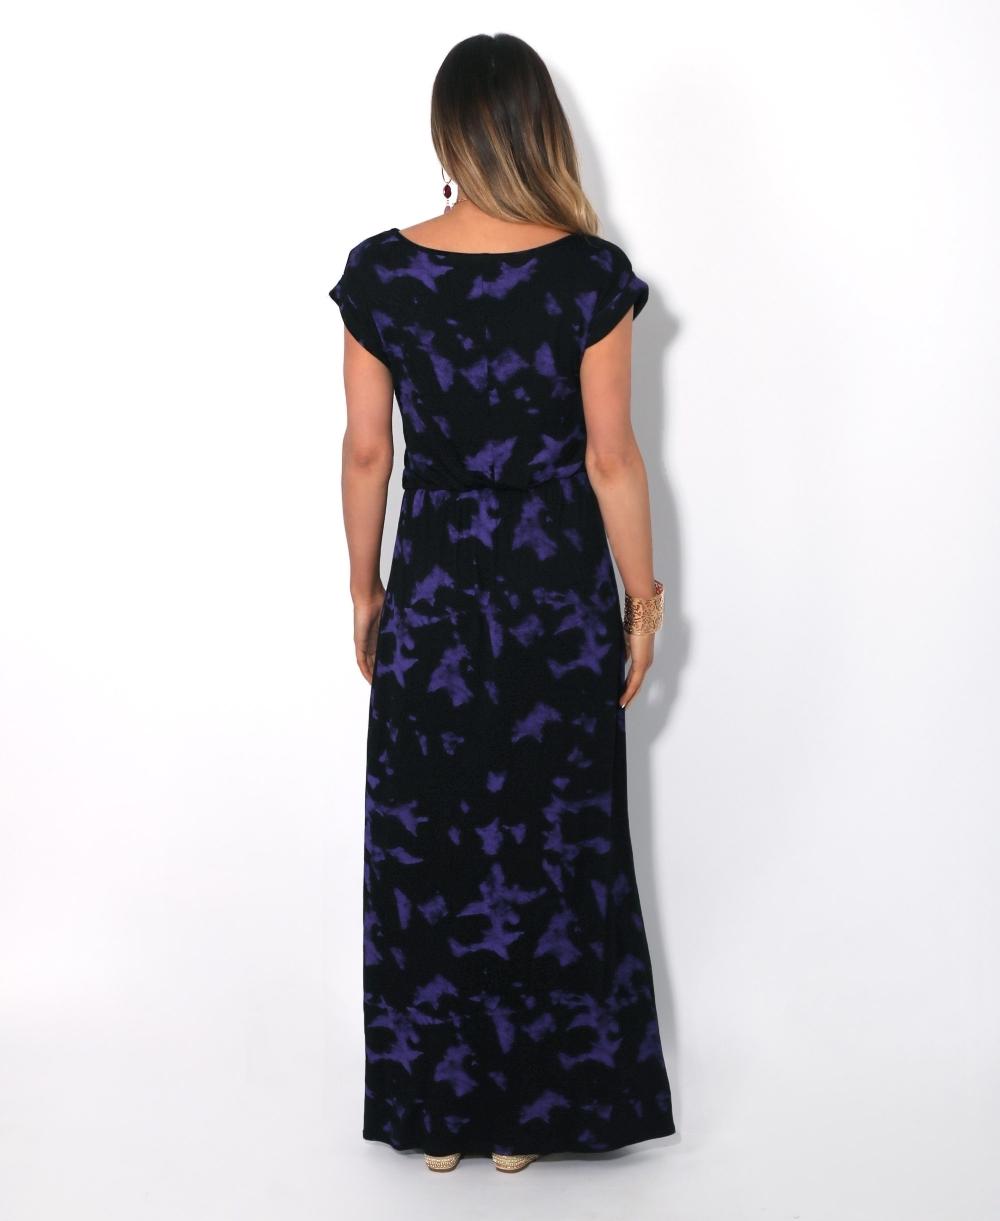 93b9f5ce5e8570 Tie Dye Jersey Maxi Dress